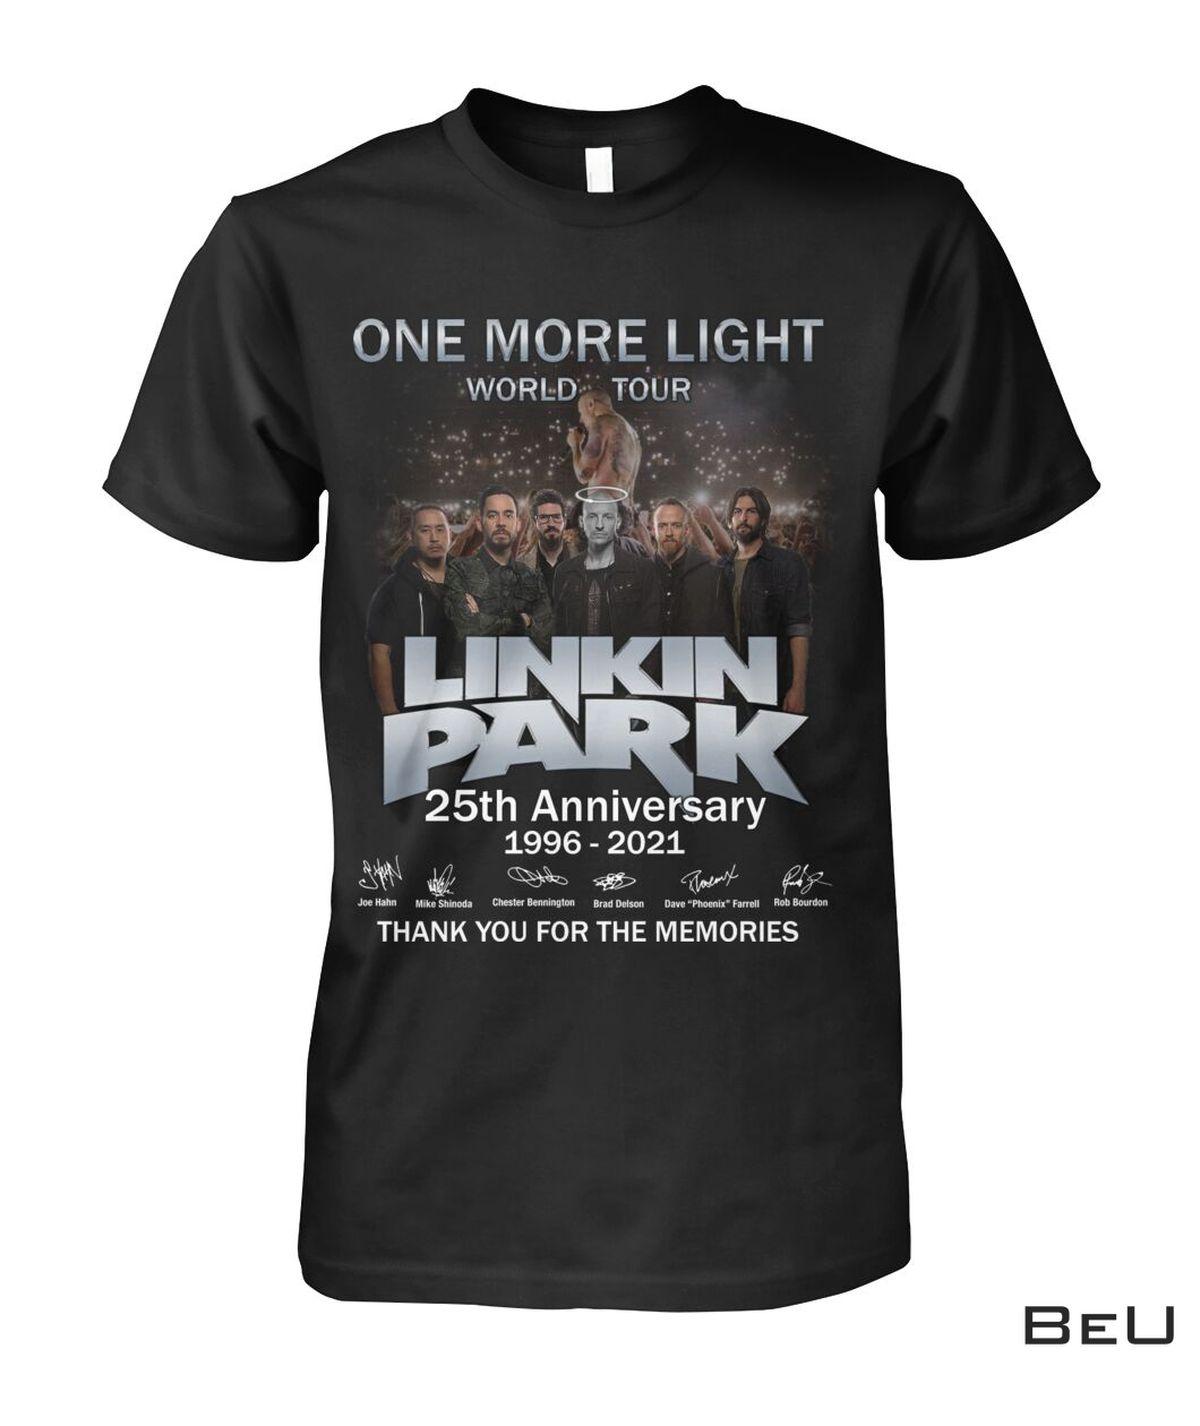 One More Light World Tour Linkin Park 25th Anniversary Shirt, hoodie, tank top